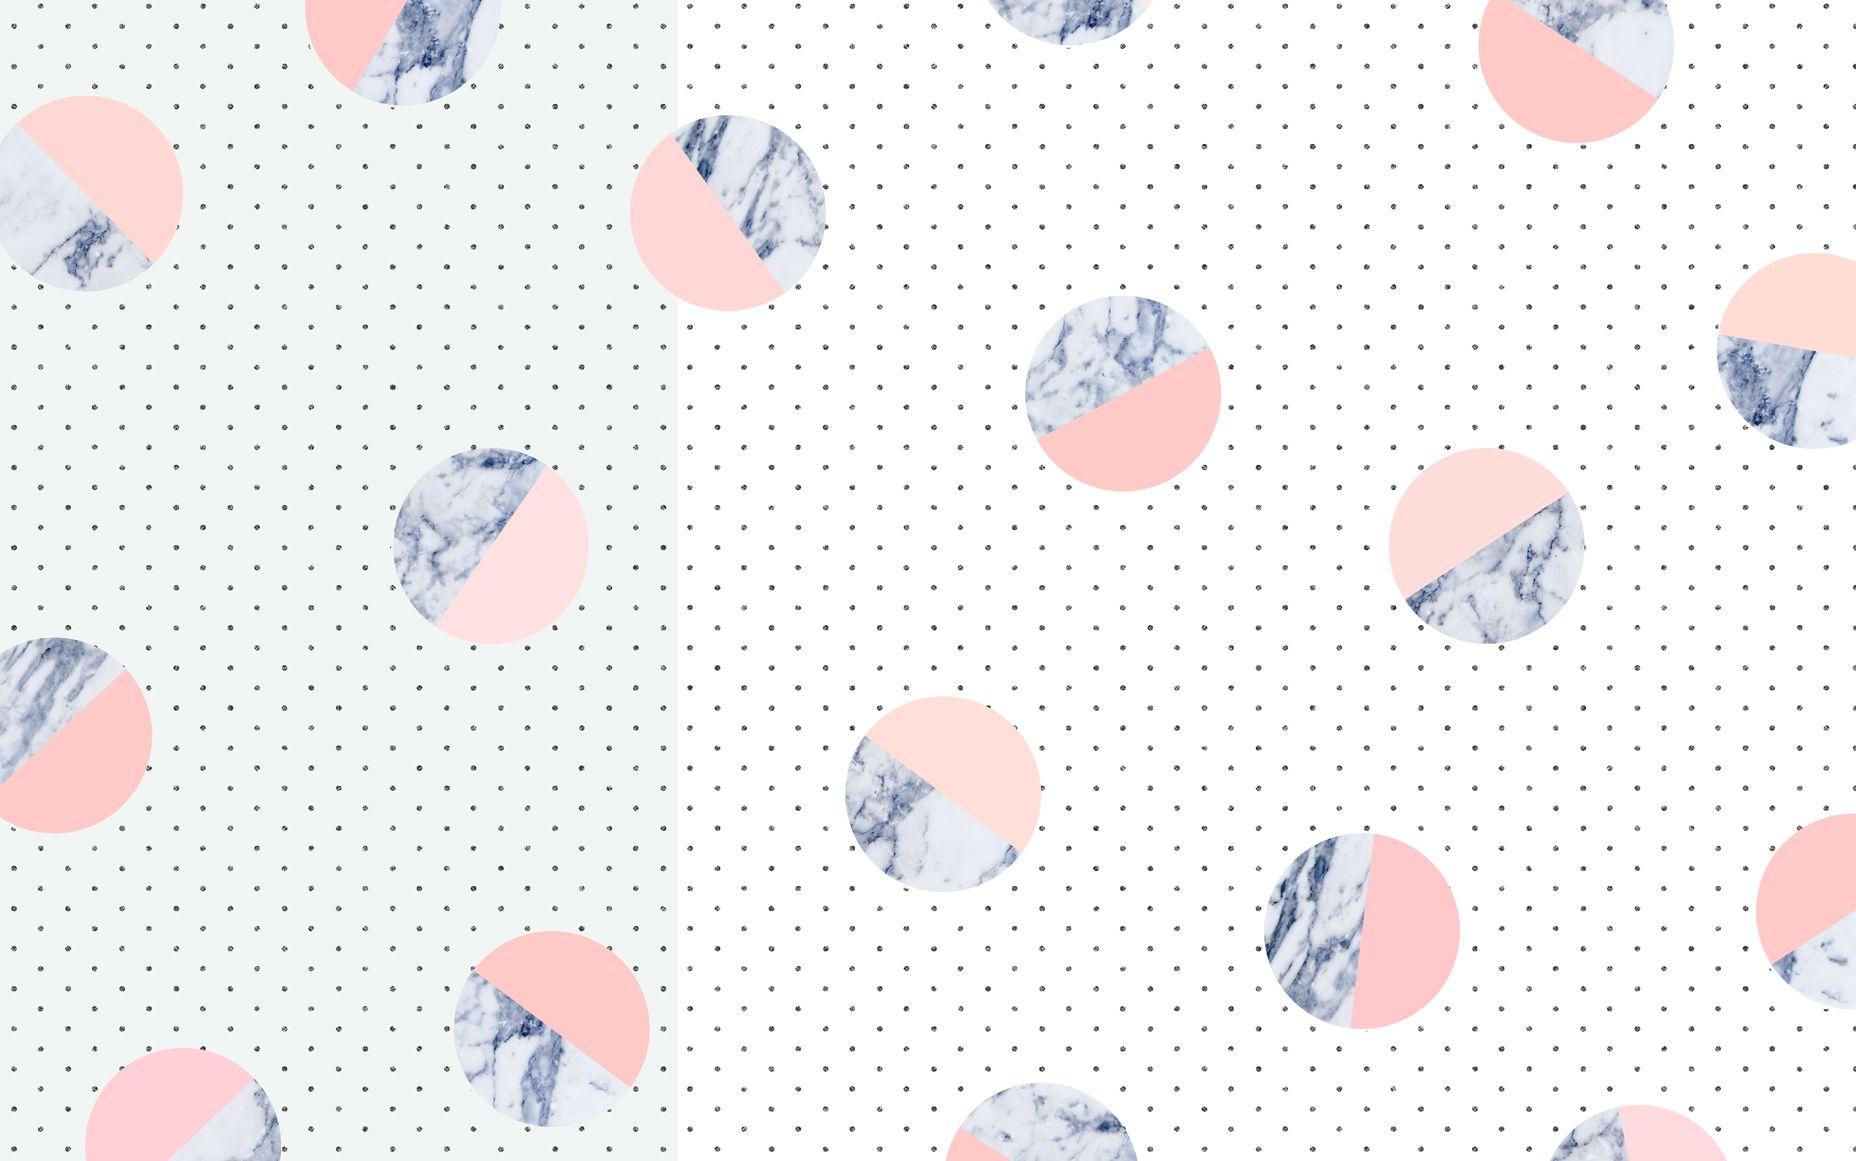 Pin by Jill Waring on Laptop Backgrounds Pattern art